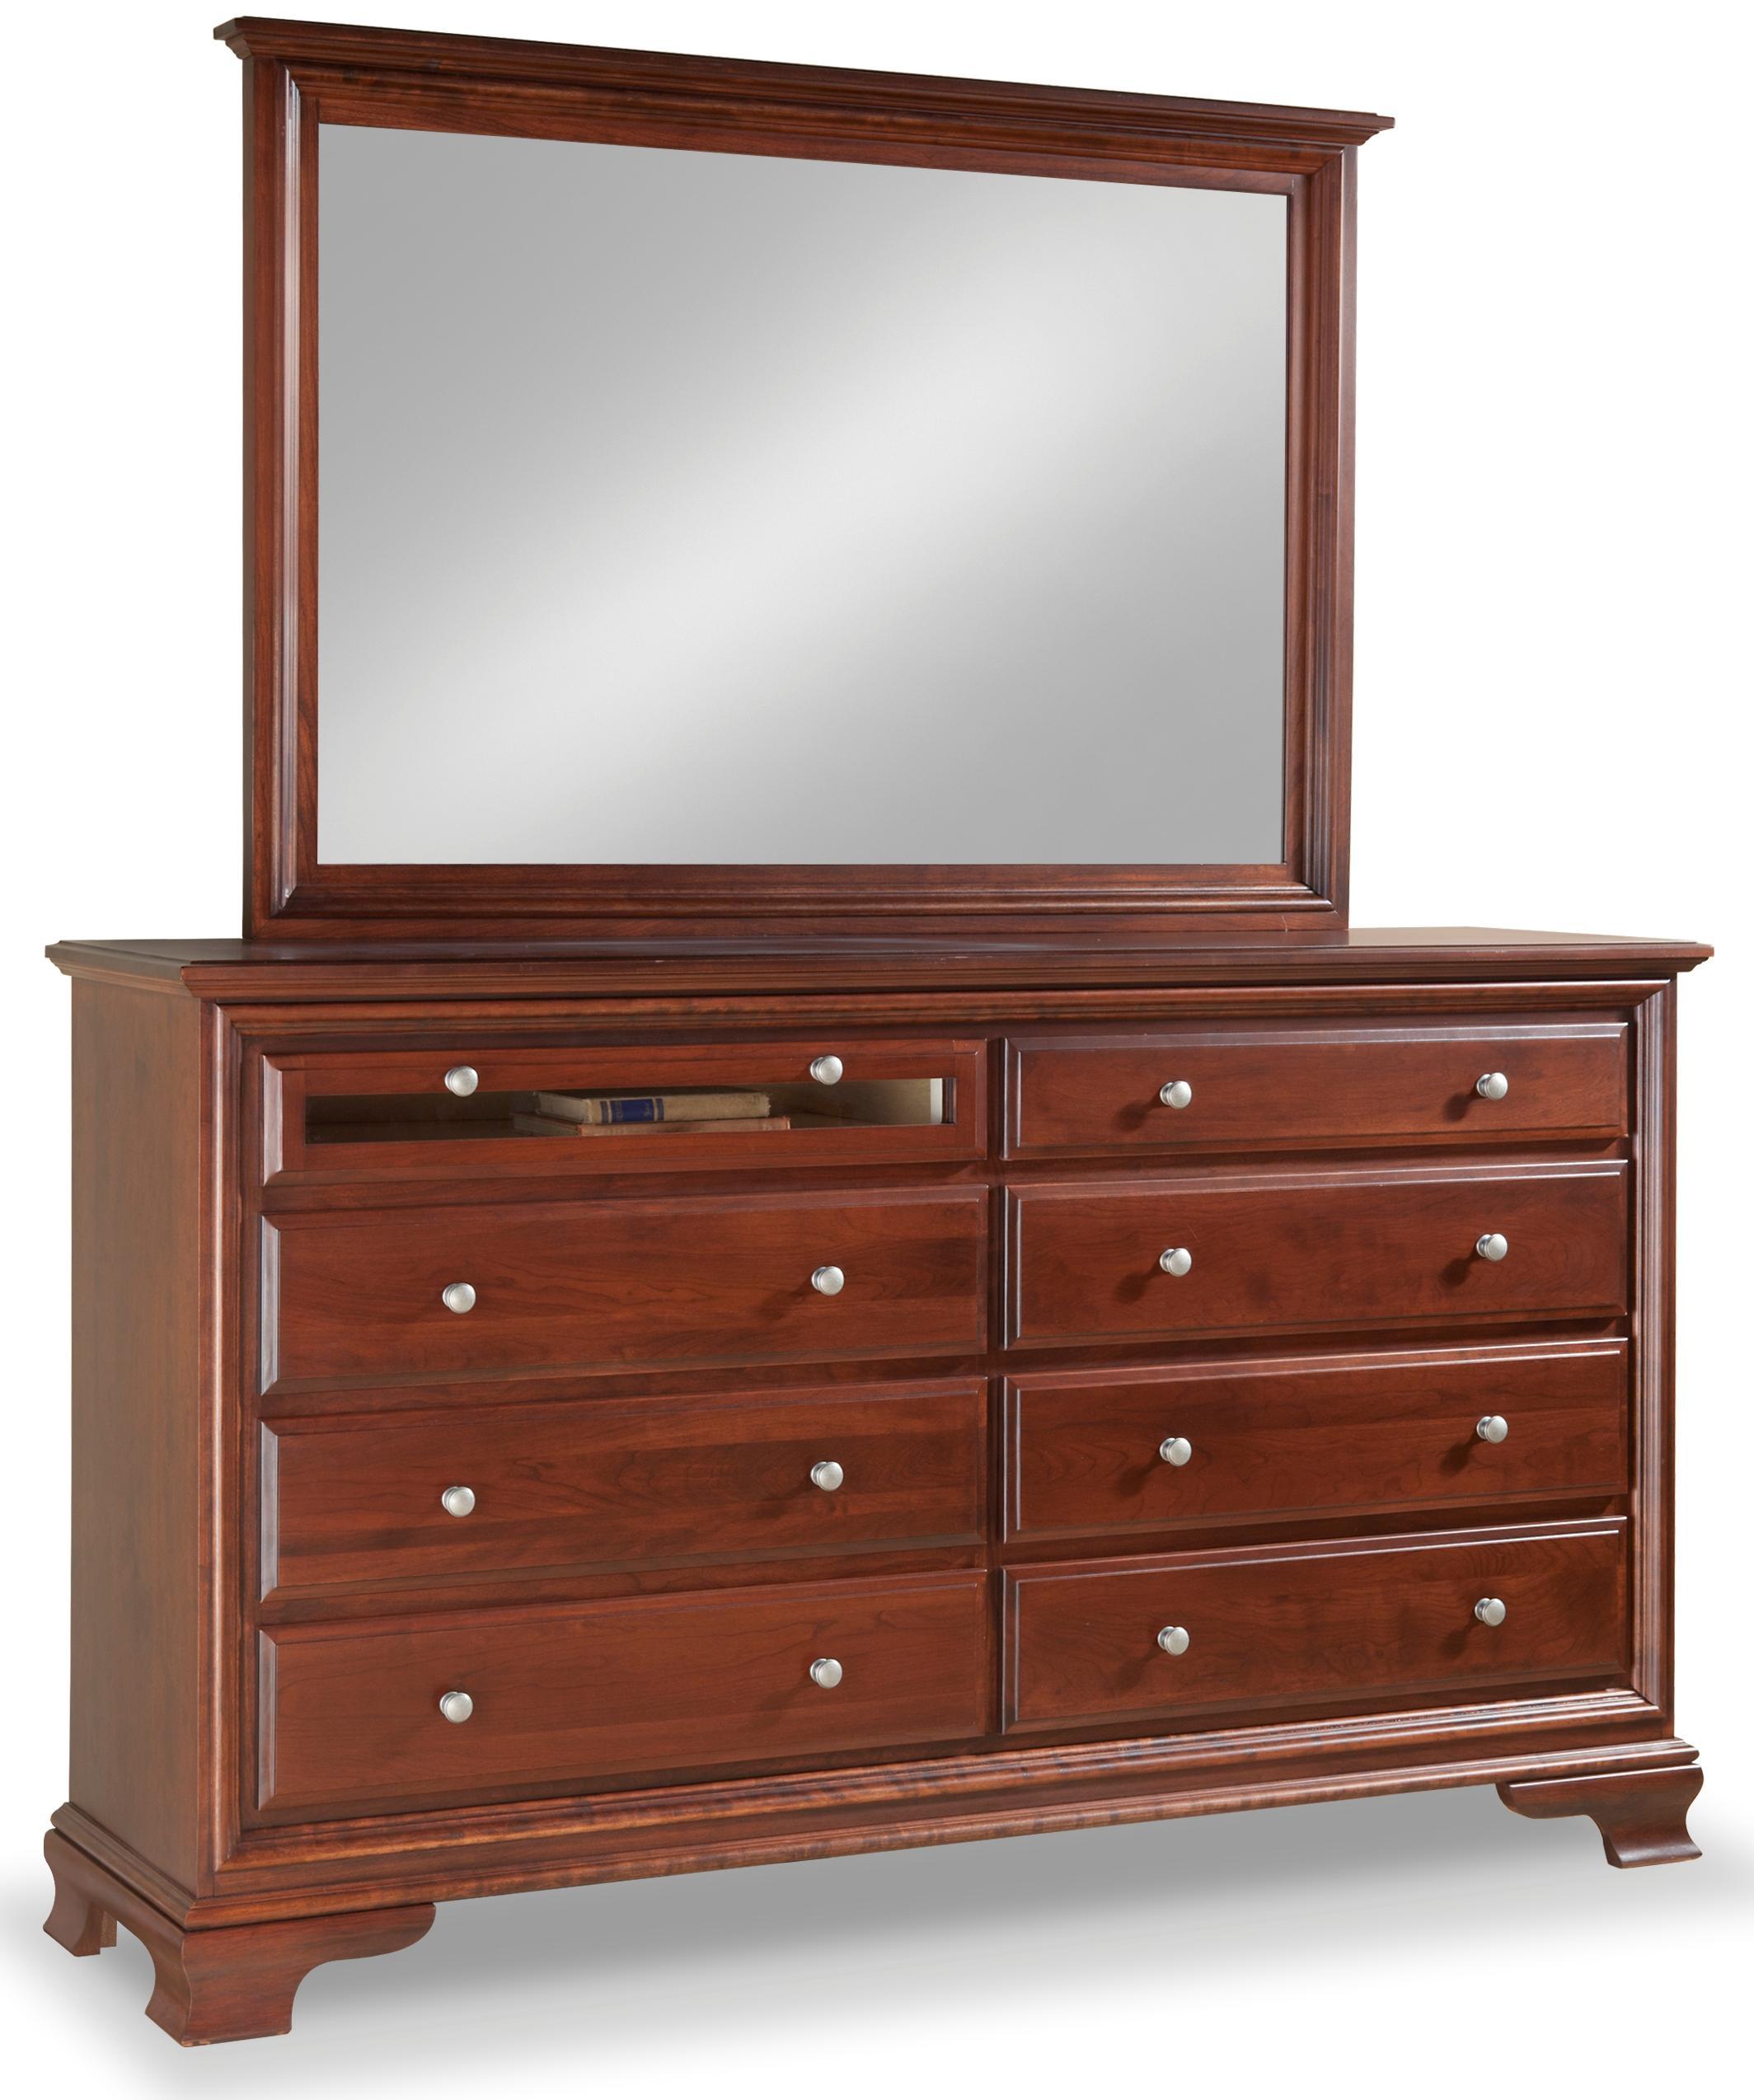 Daniel s Amish Classic Landscape Dresser Mirror Fashion